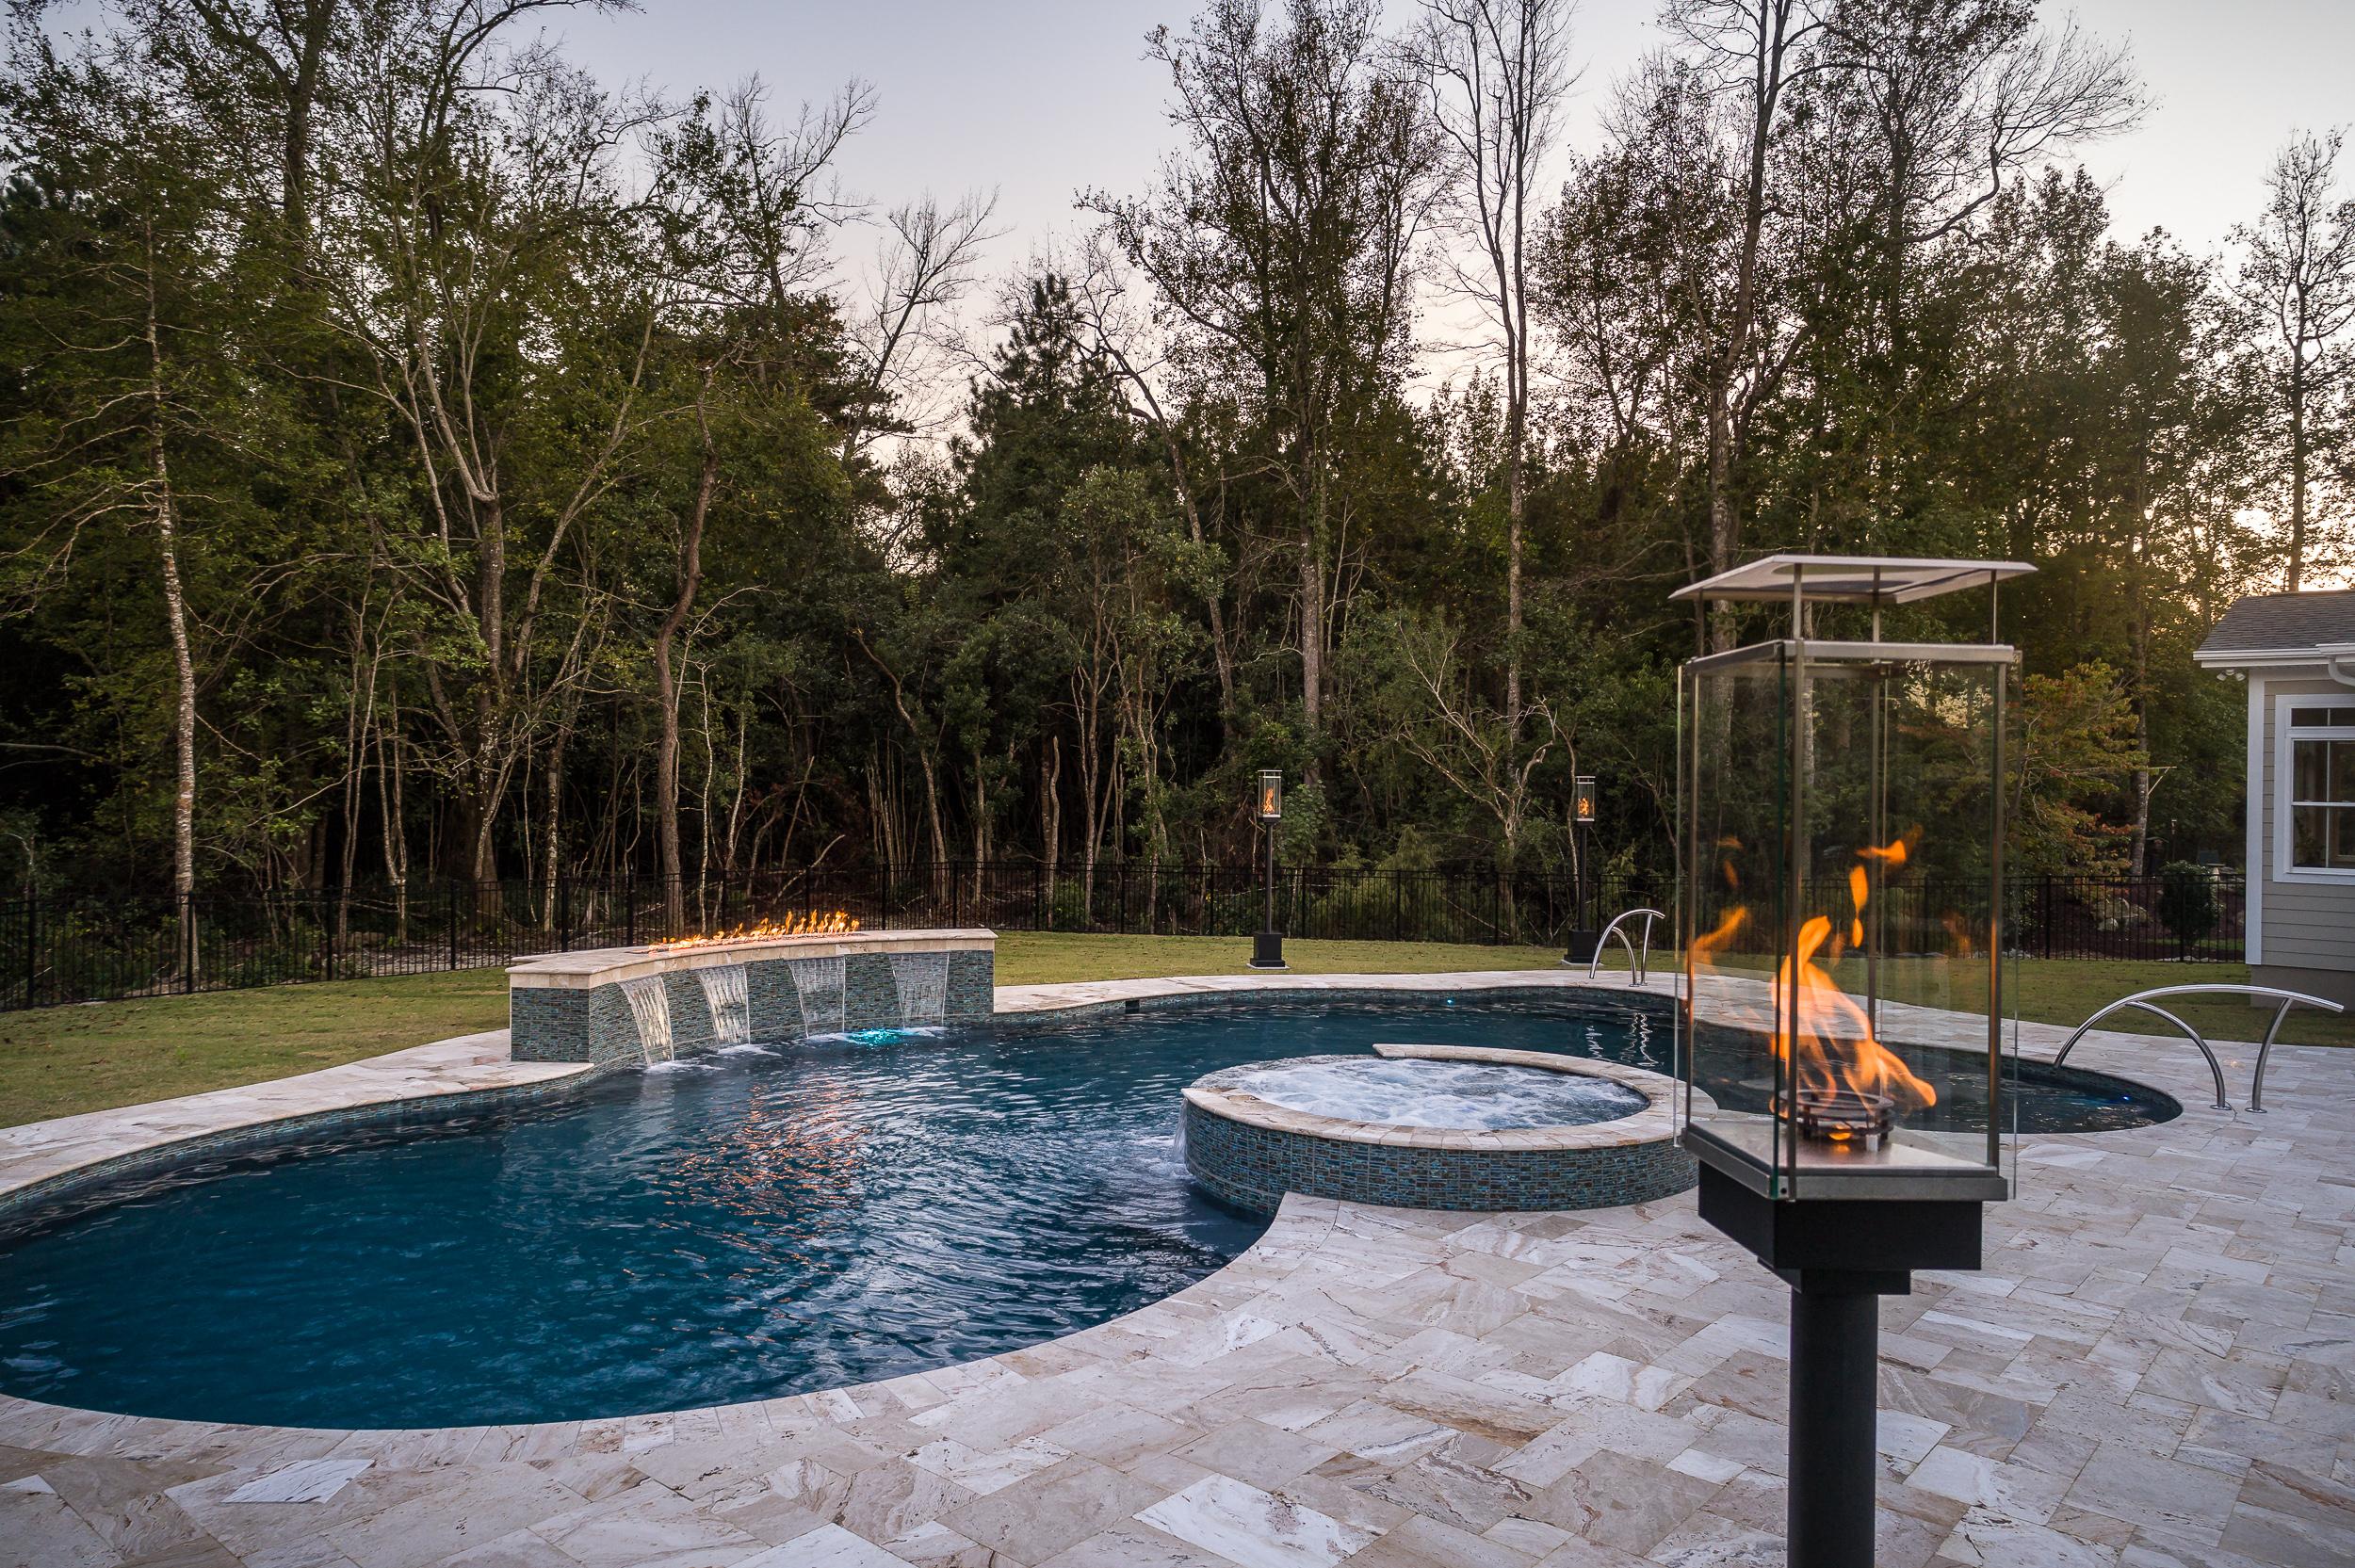 Vinyl liner swimming pools, fiberglass swimming pools